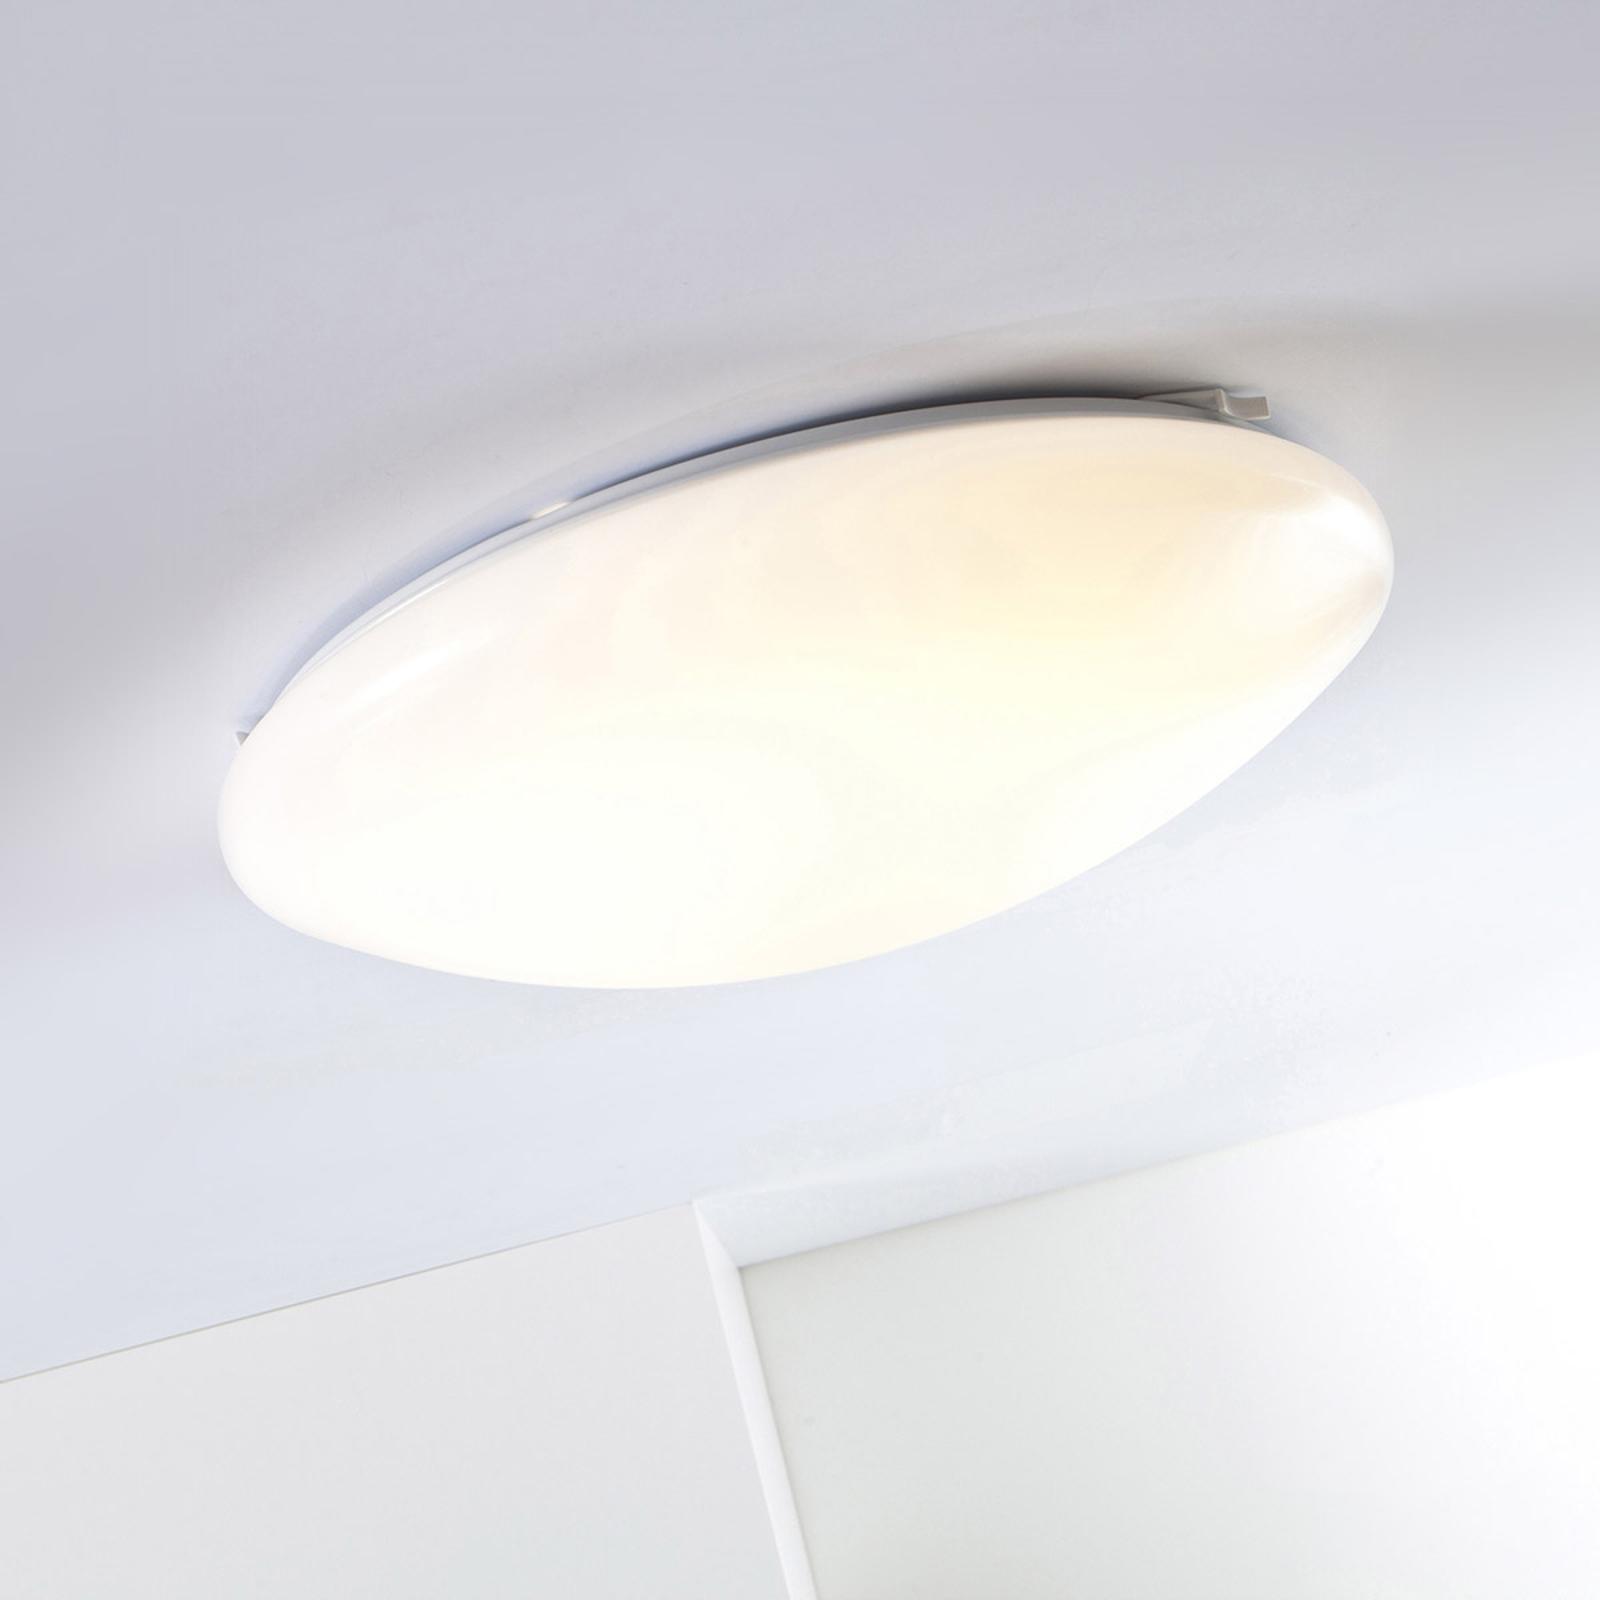 Plafón LED Basic circular, de AEG, 14 W